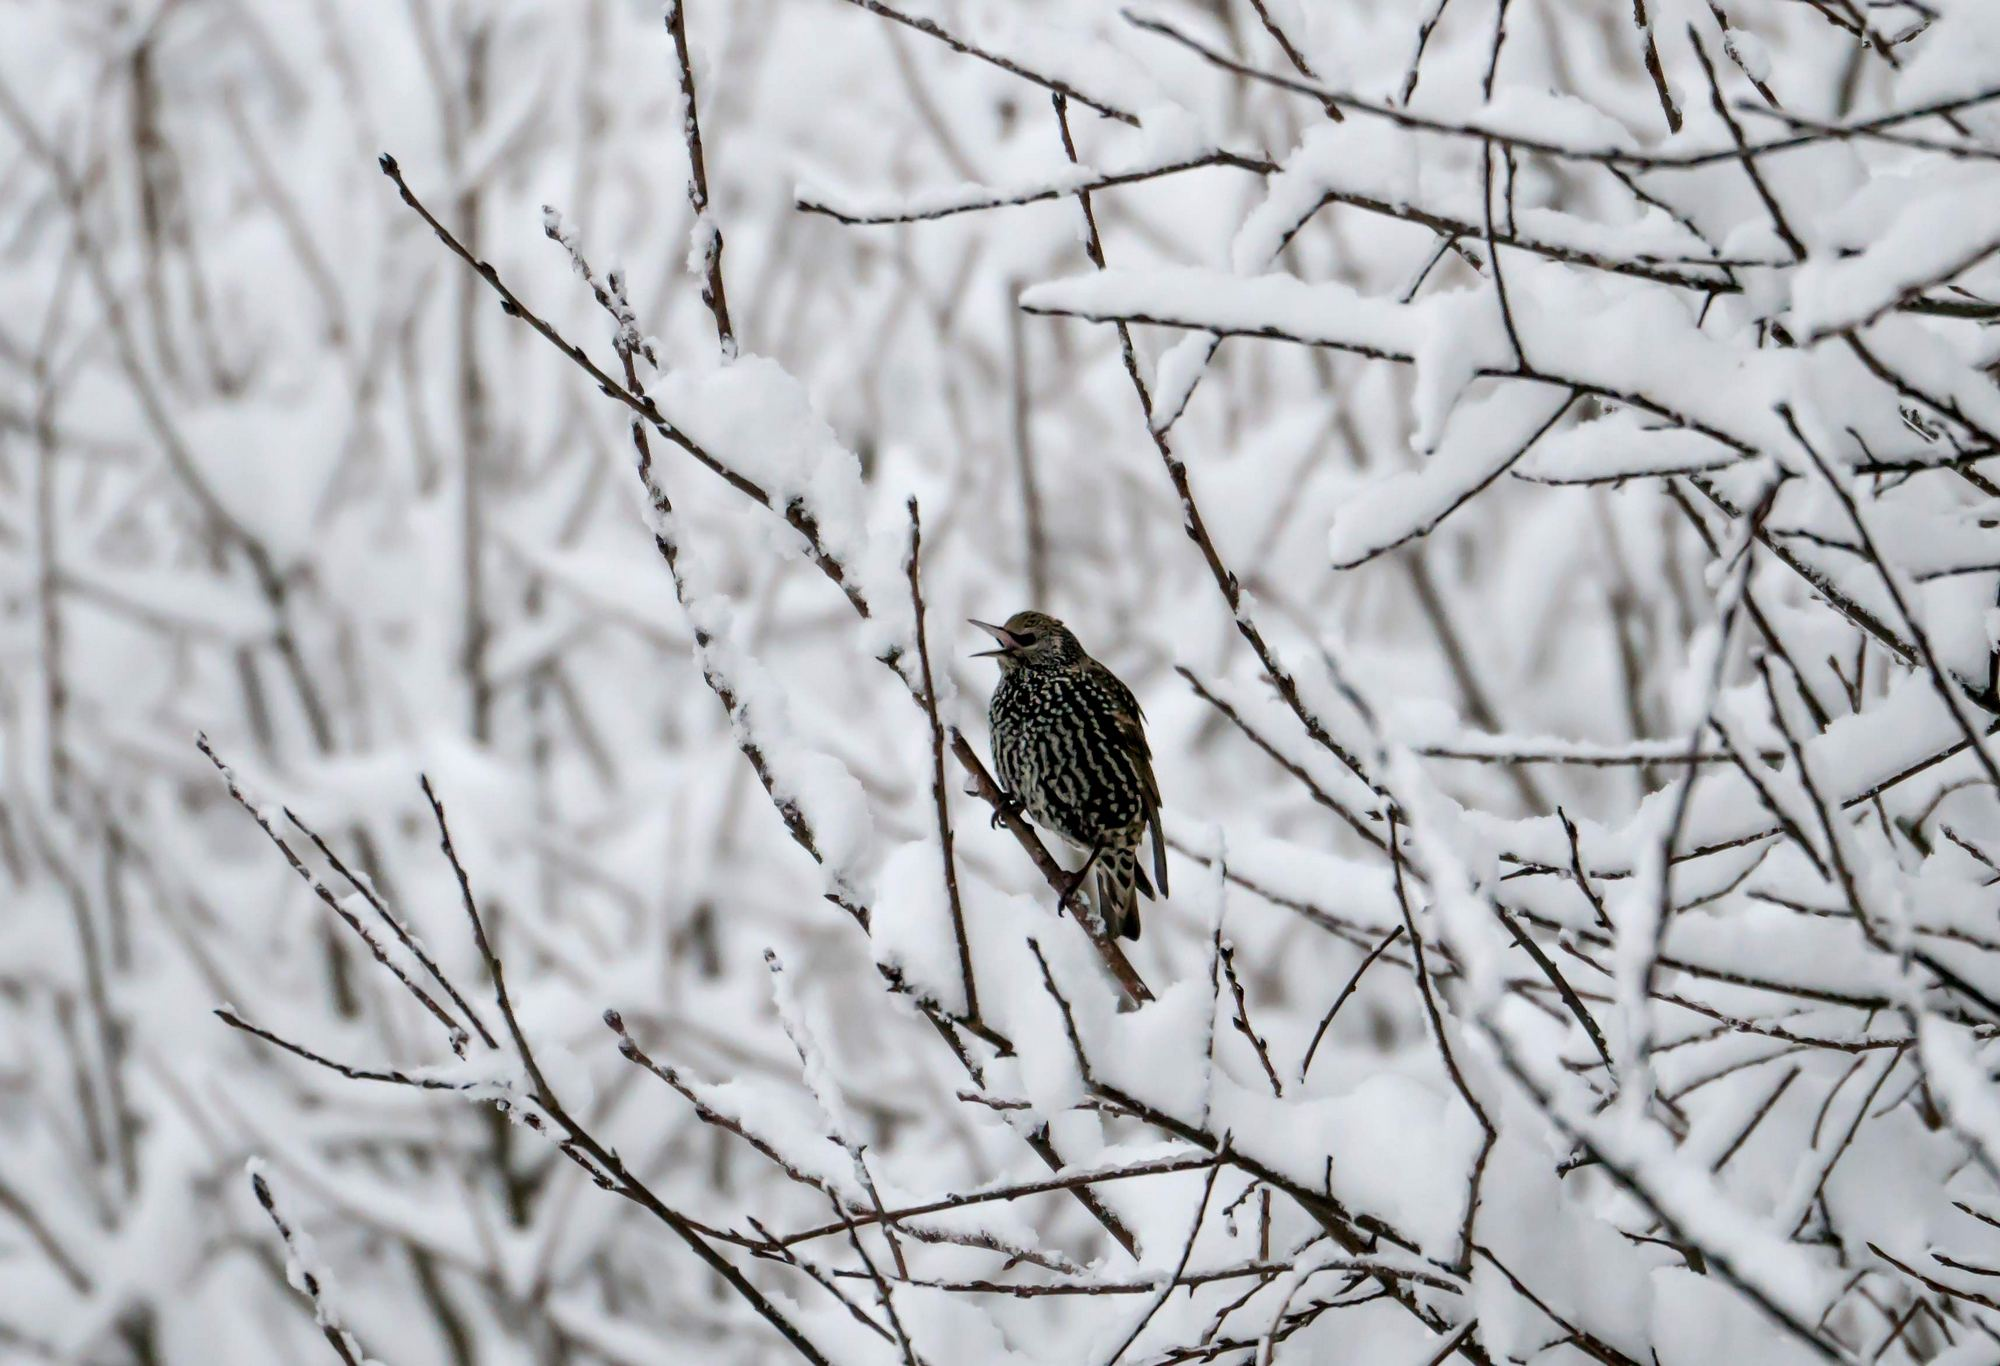 фото скворцов зимой